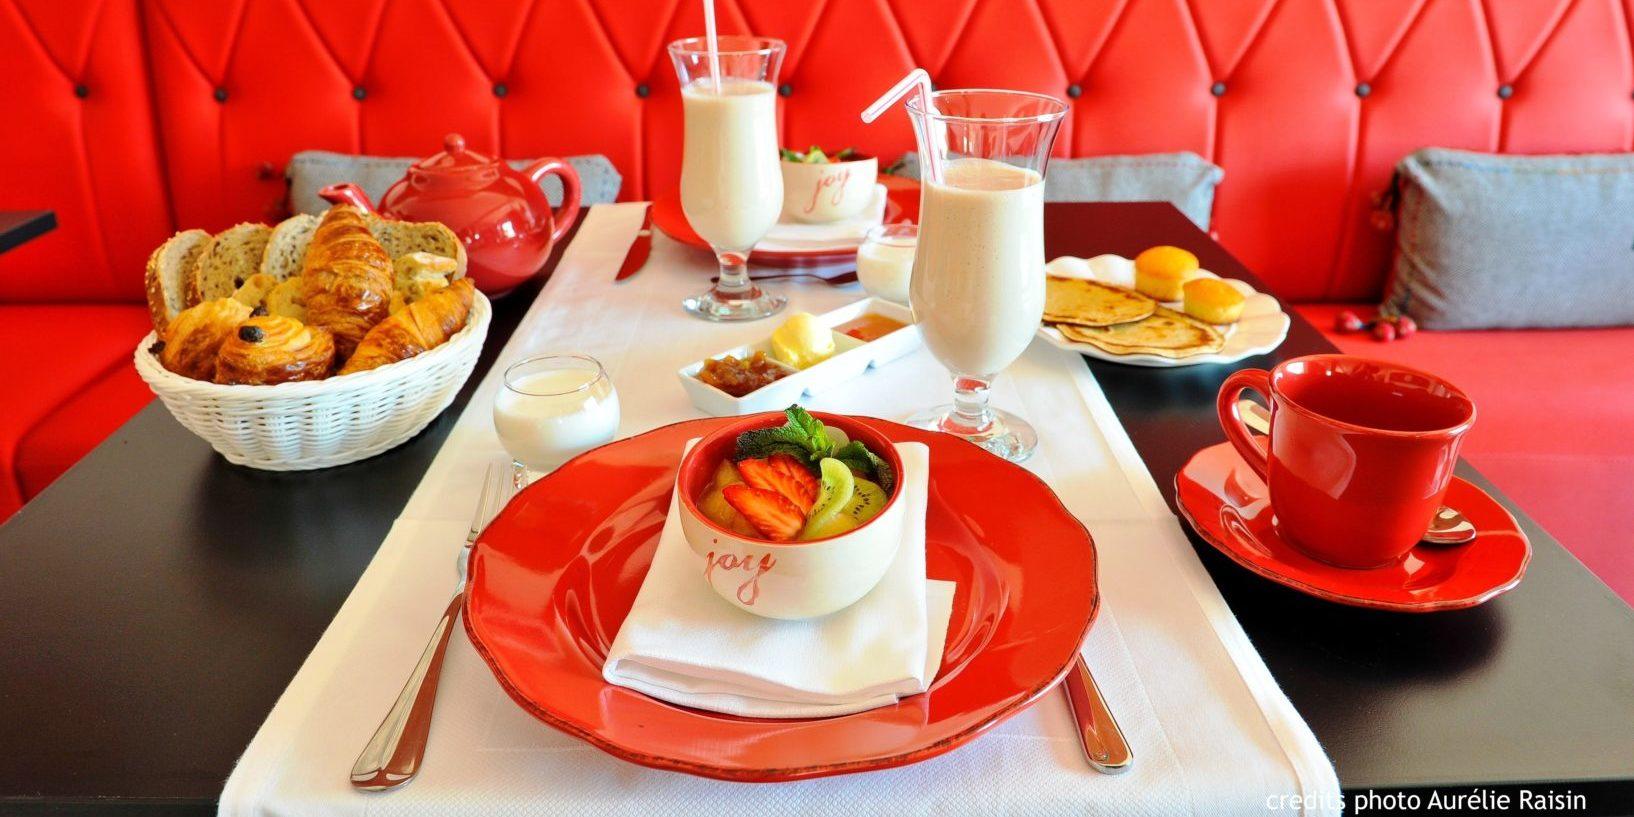 Boutique Hotel Liberata Ile Rousse Balagne Corsica Frankrijk ontbijt-aan-tafel